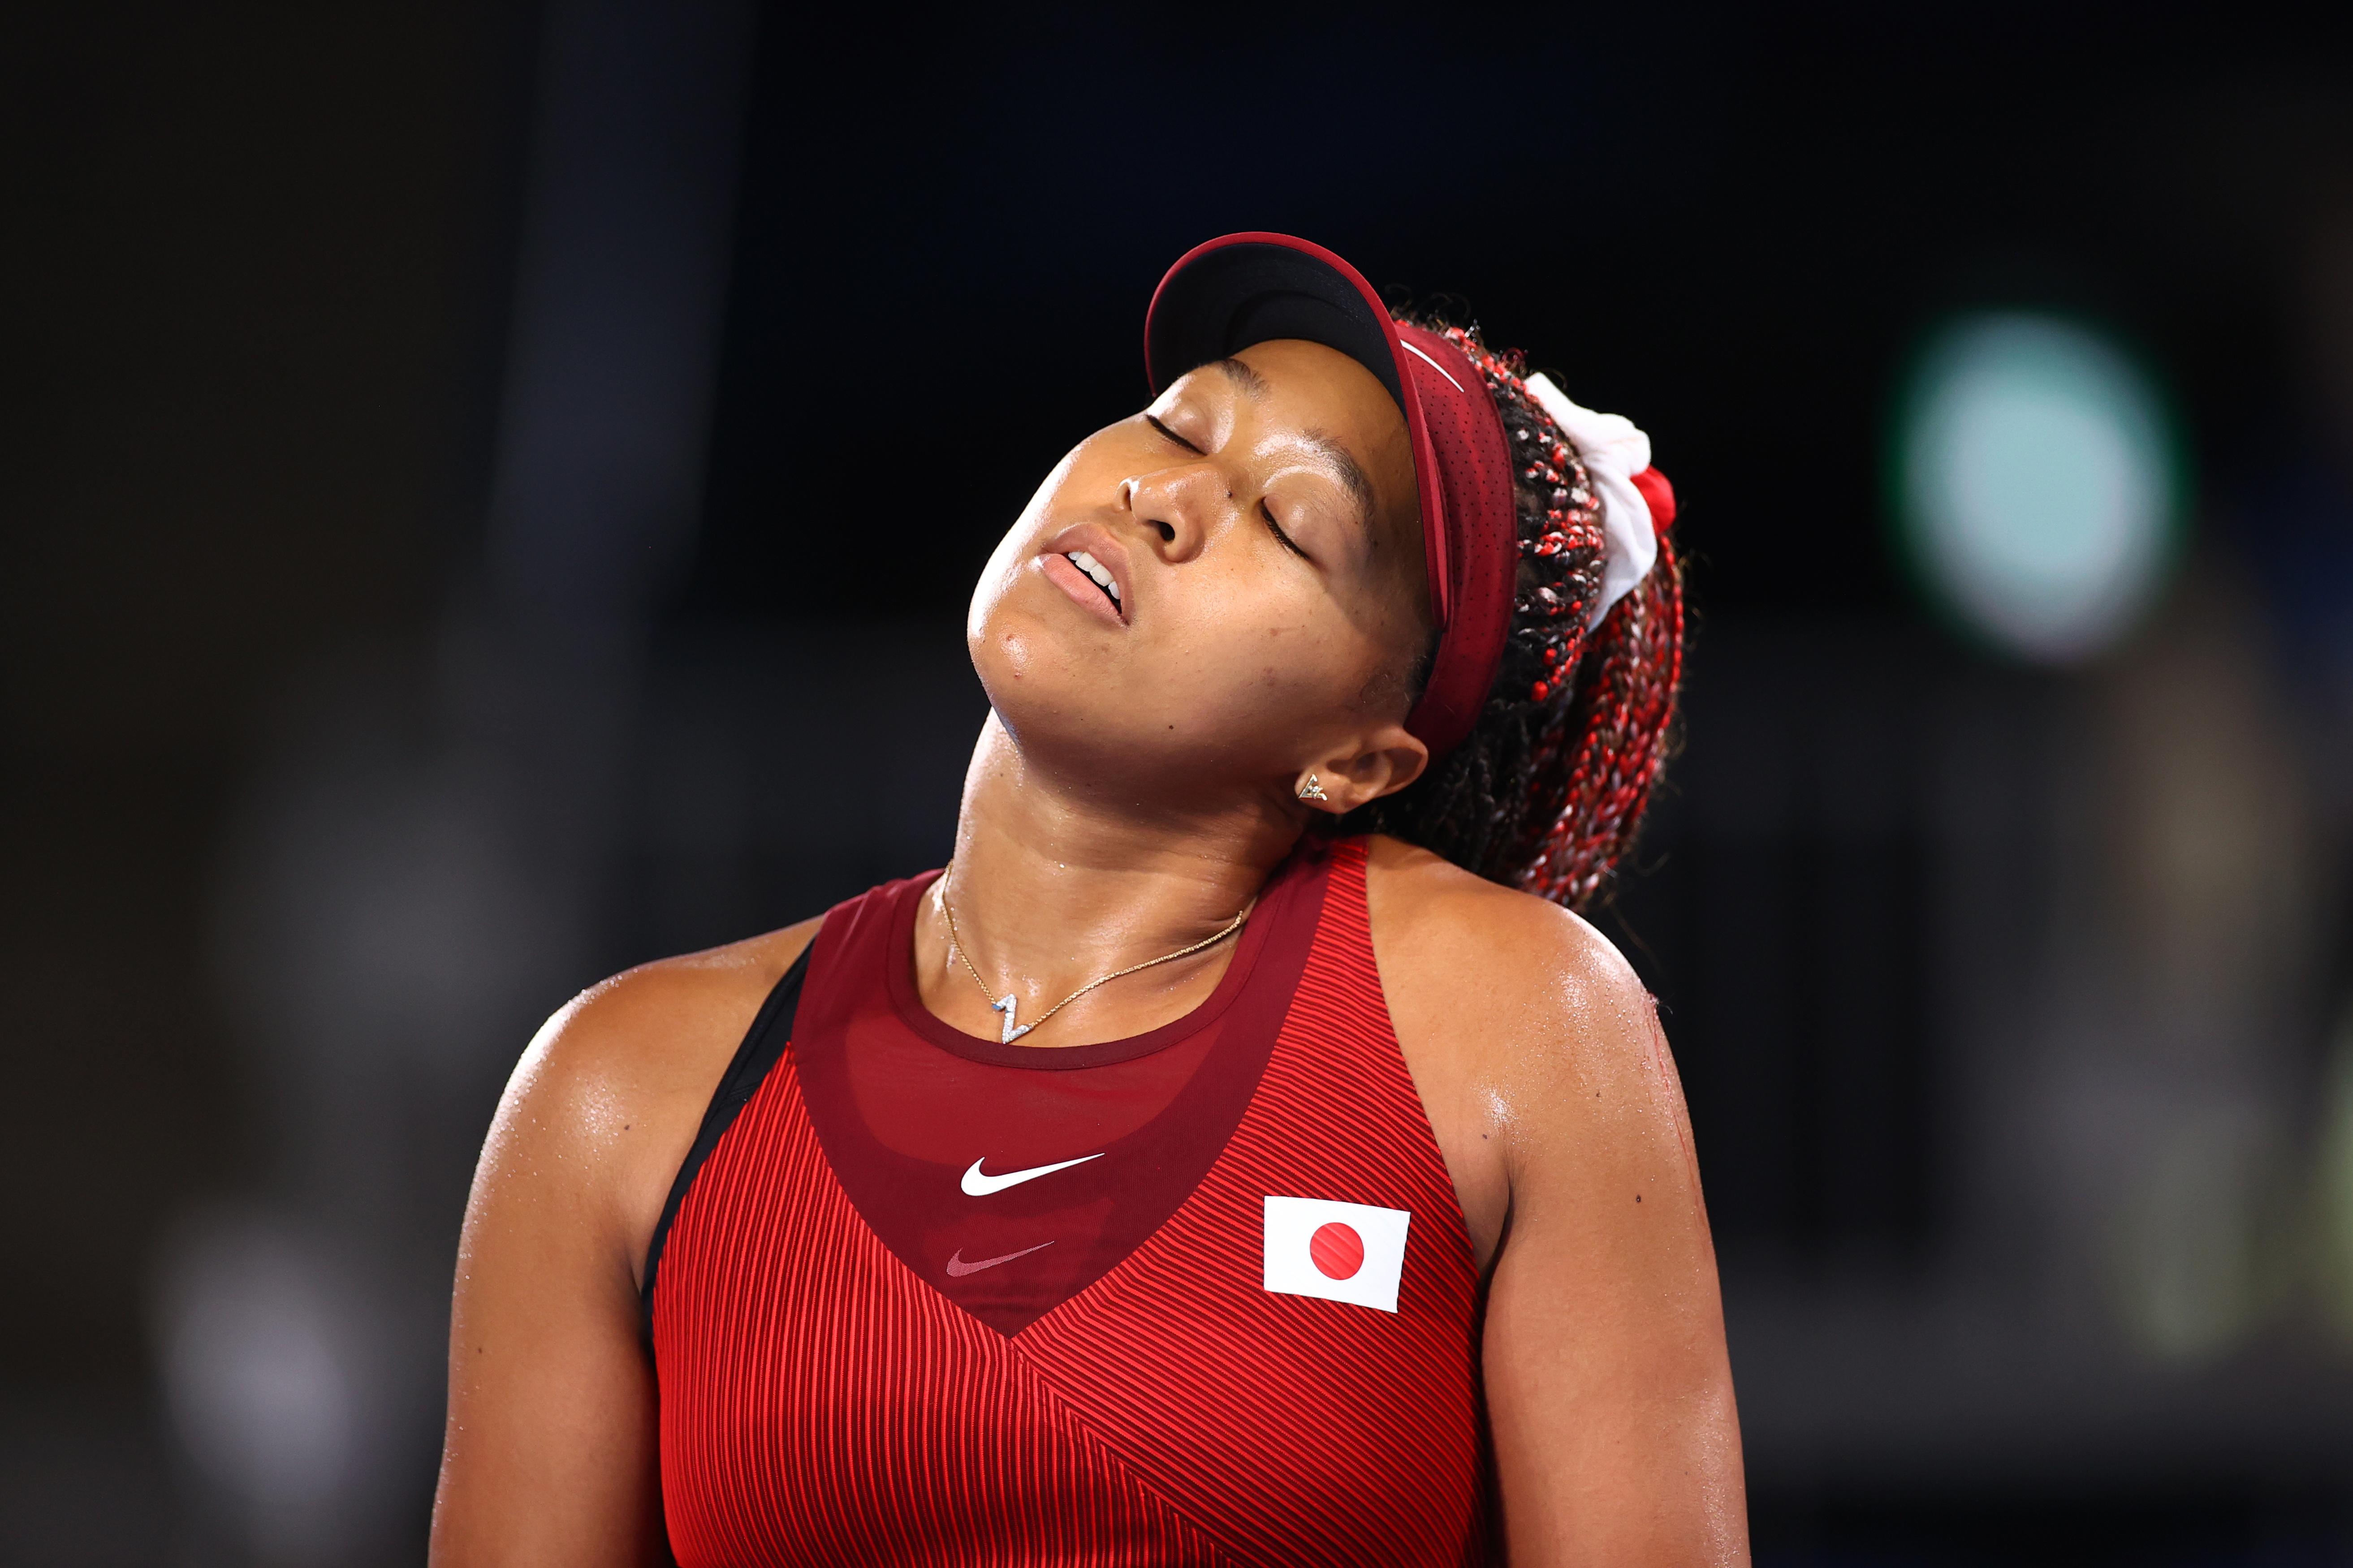 Naomi Osaka of Japan reacts during her third round match against Marketa Vondrousova of Czech Republic